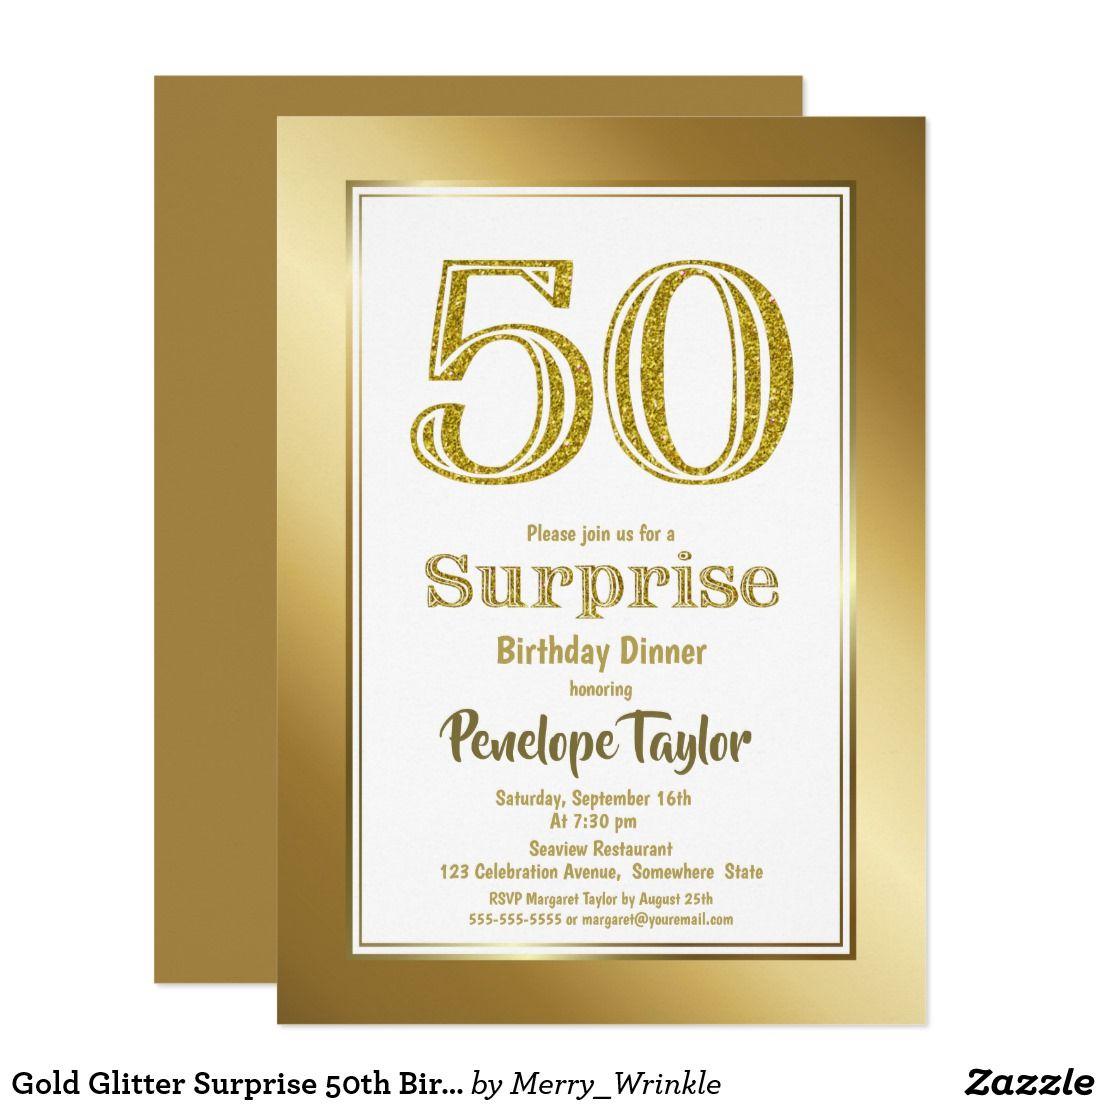 Gold Glitter Surprise 50th Birthday Dinner Party Invitation